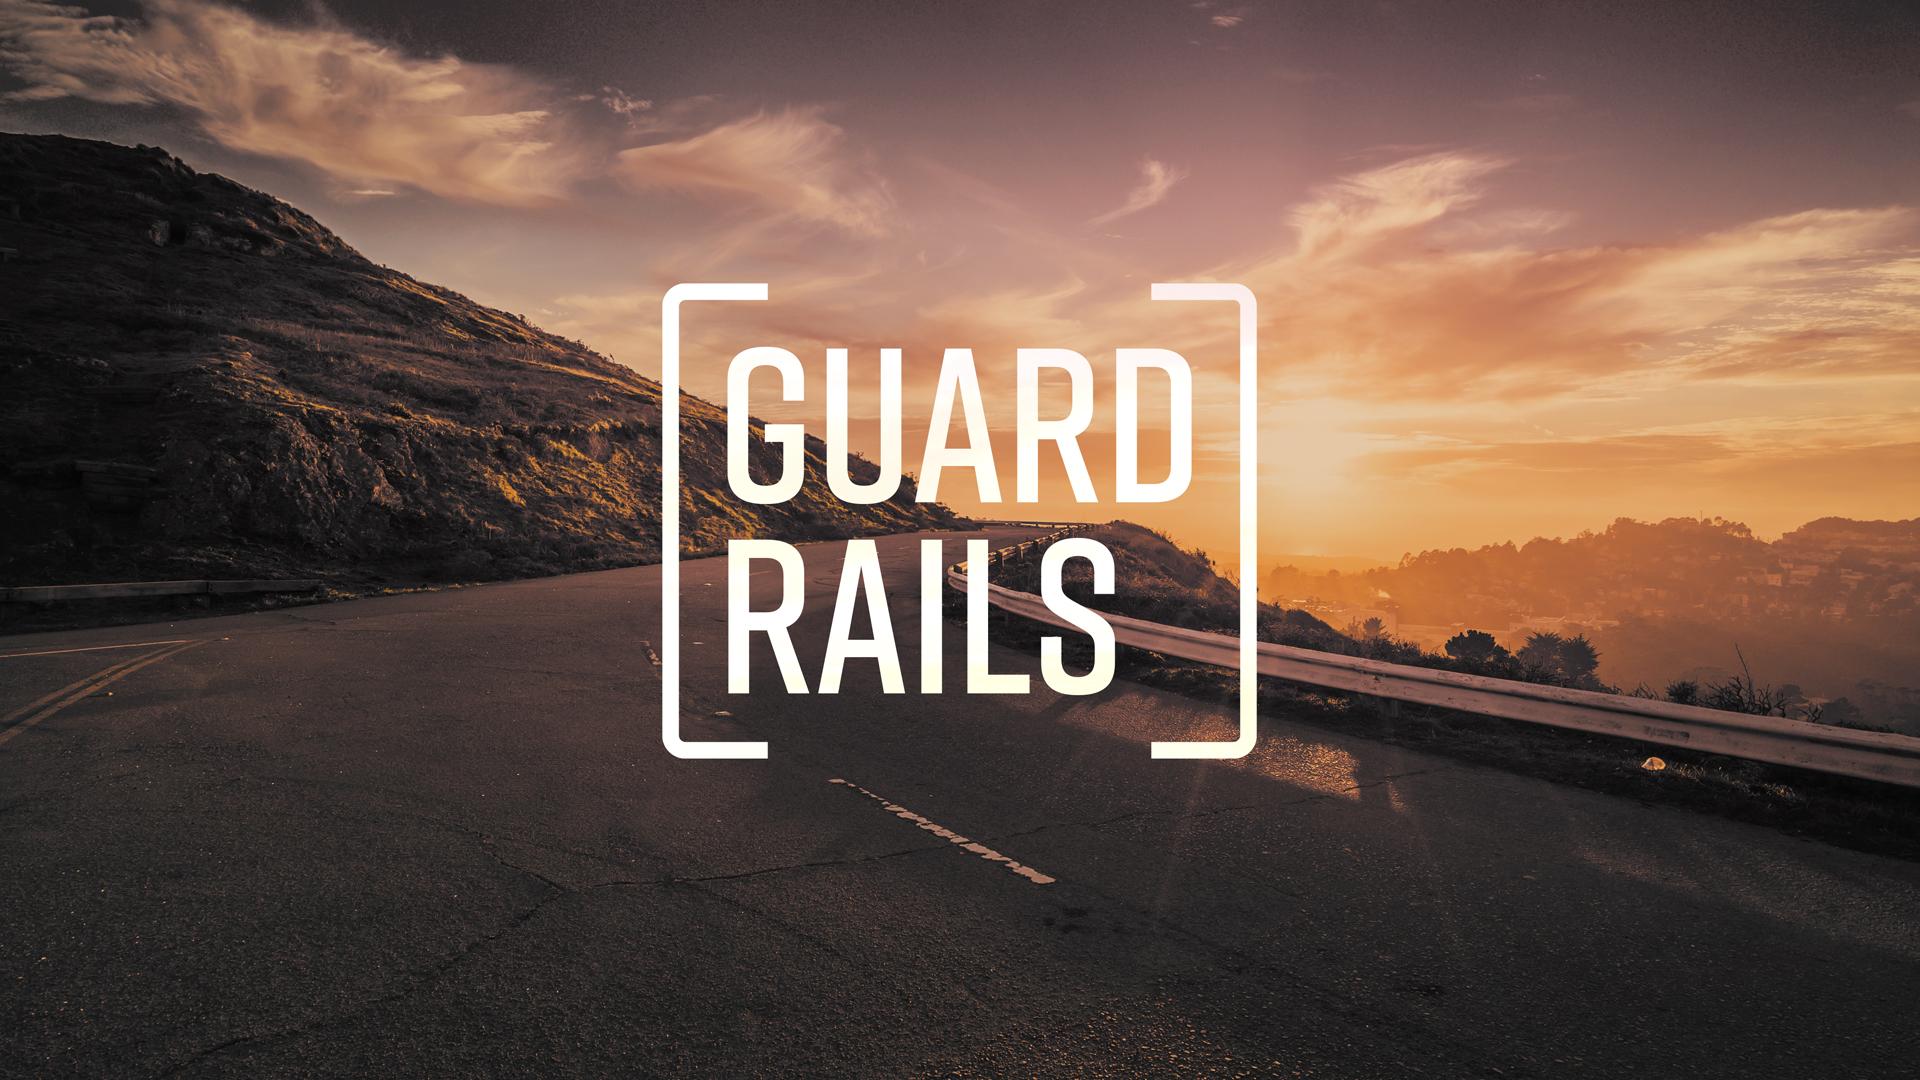 - Guardrails 4: The Heart of the MatterJune 9, 2019Speaker: JJ Williams